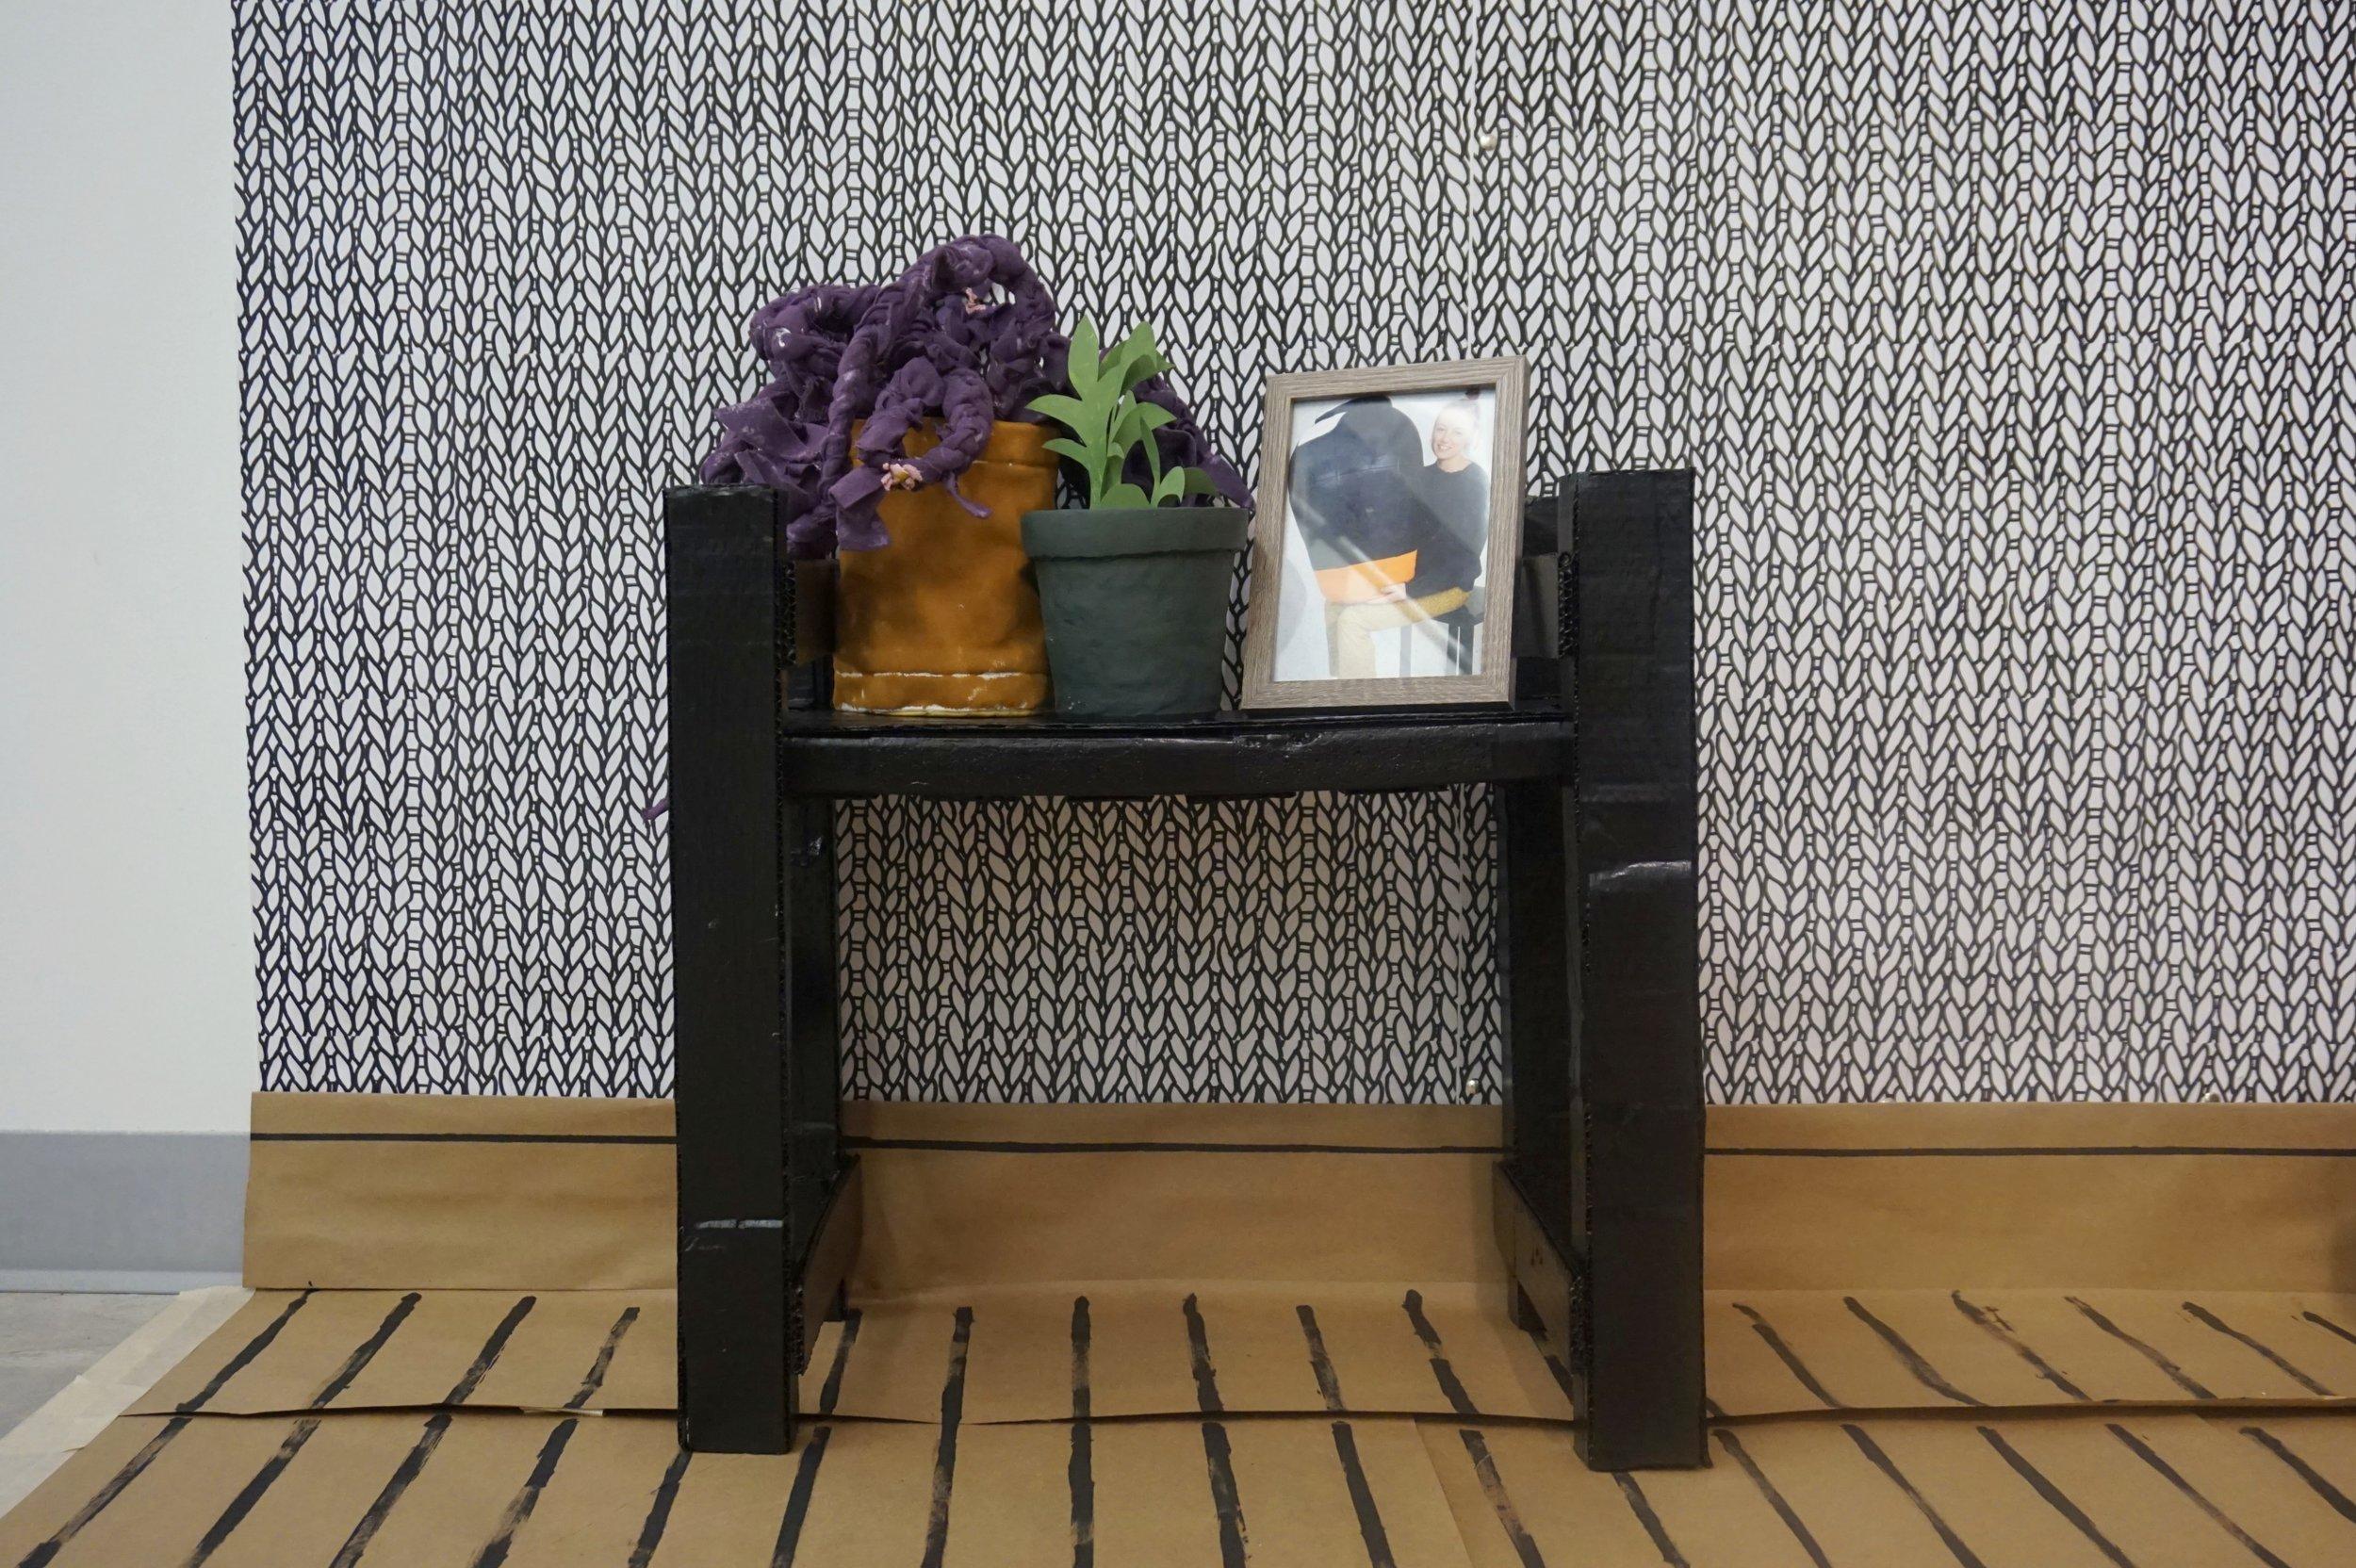 Shelf with Plants and Portrait